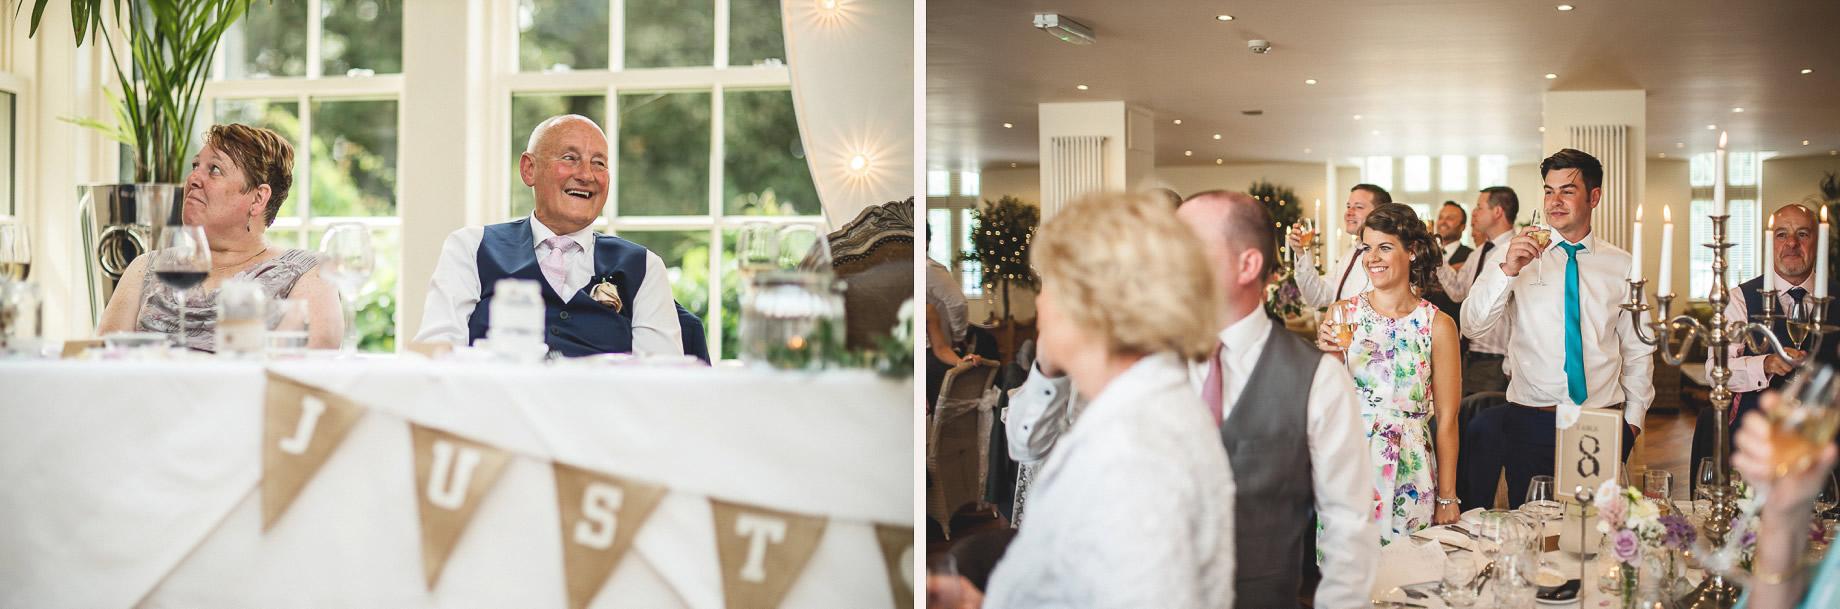 Helen and Matt's Wedding at Mitton Hall 099